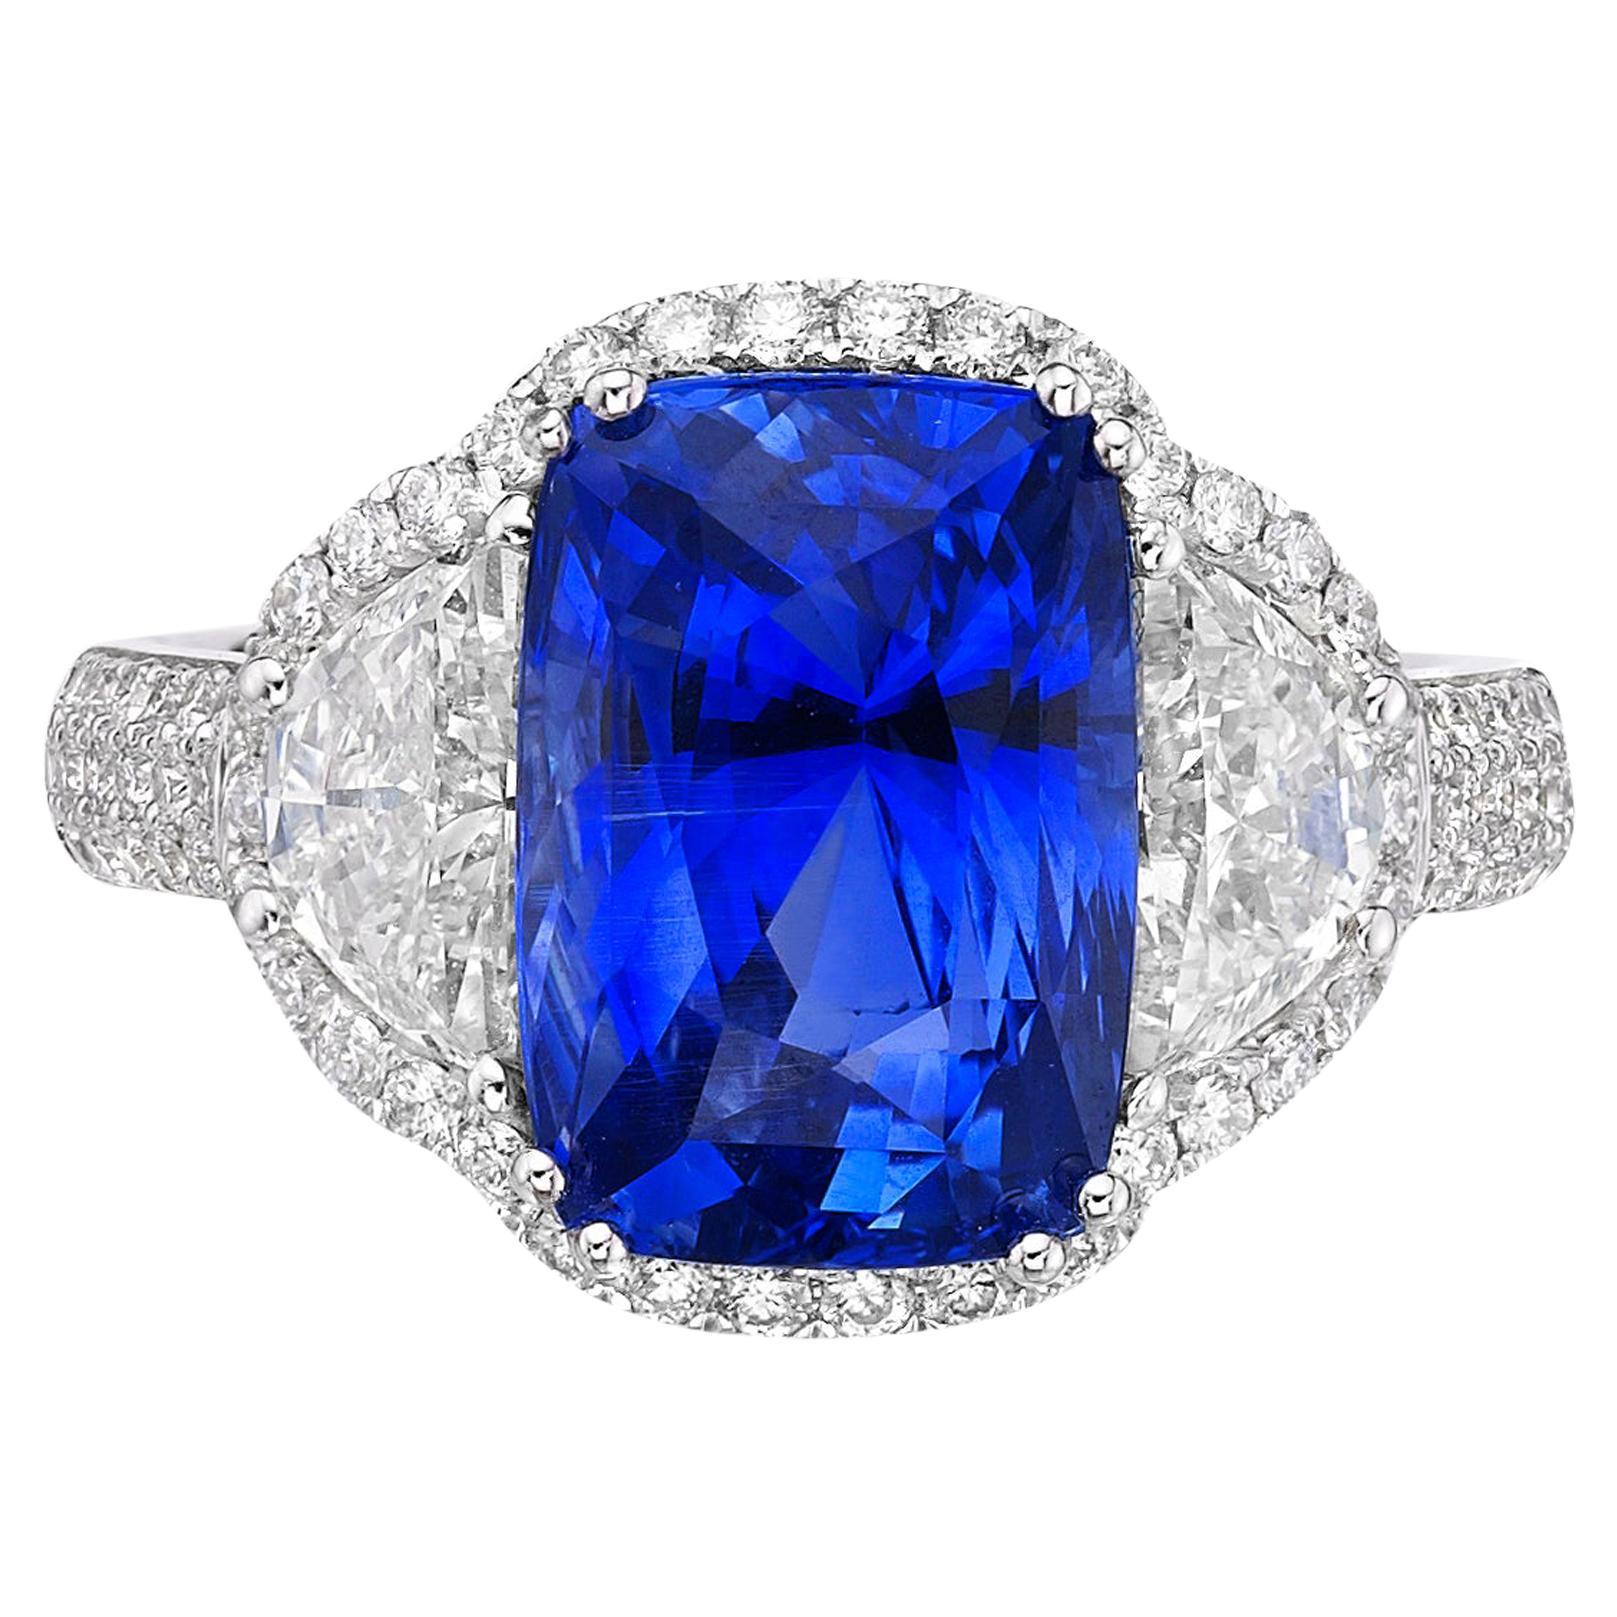 6.77 Carat Blue Sapphire GRS Certified Unheated Diamond Ceylon Ring Cushion Cut